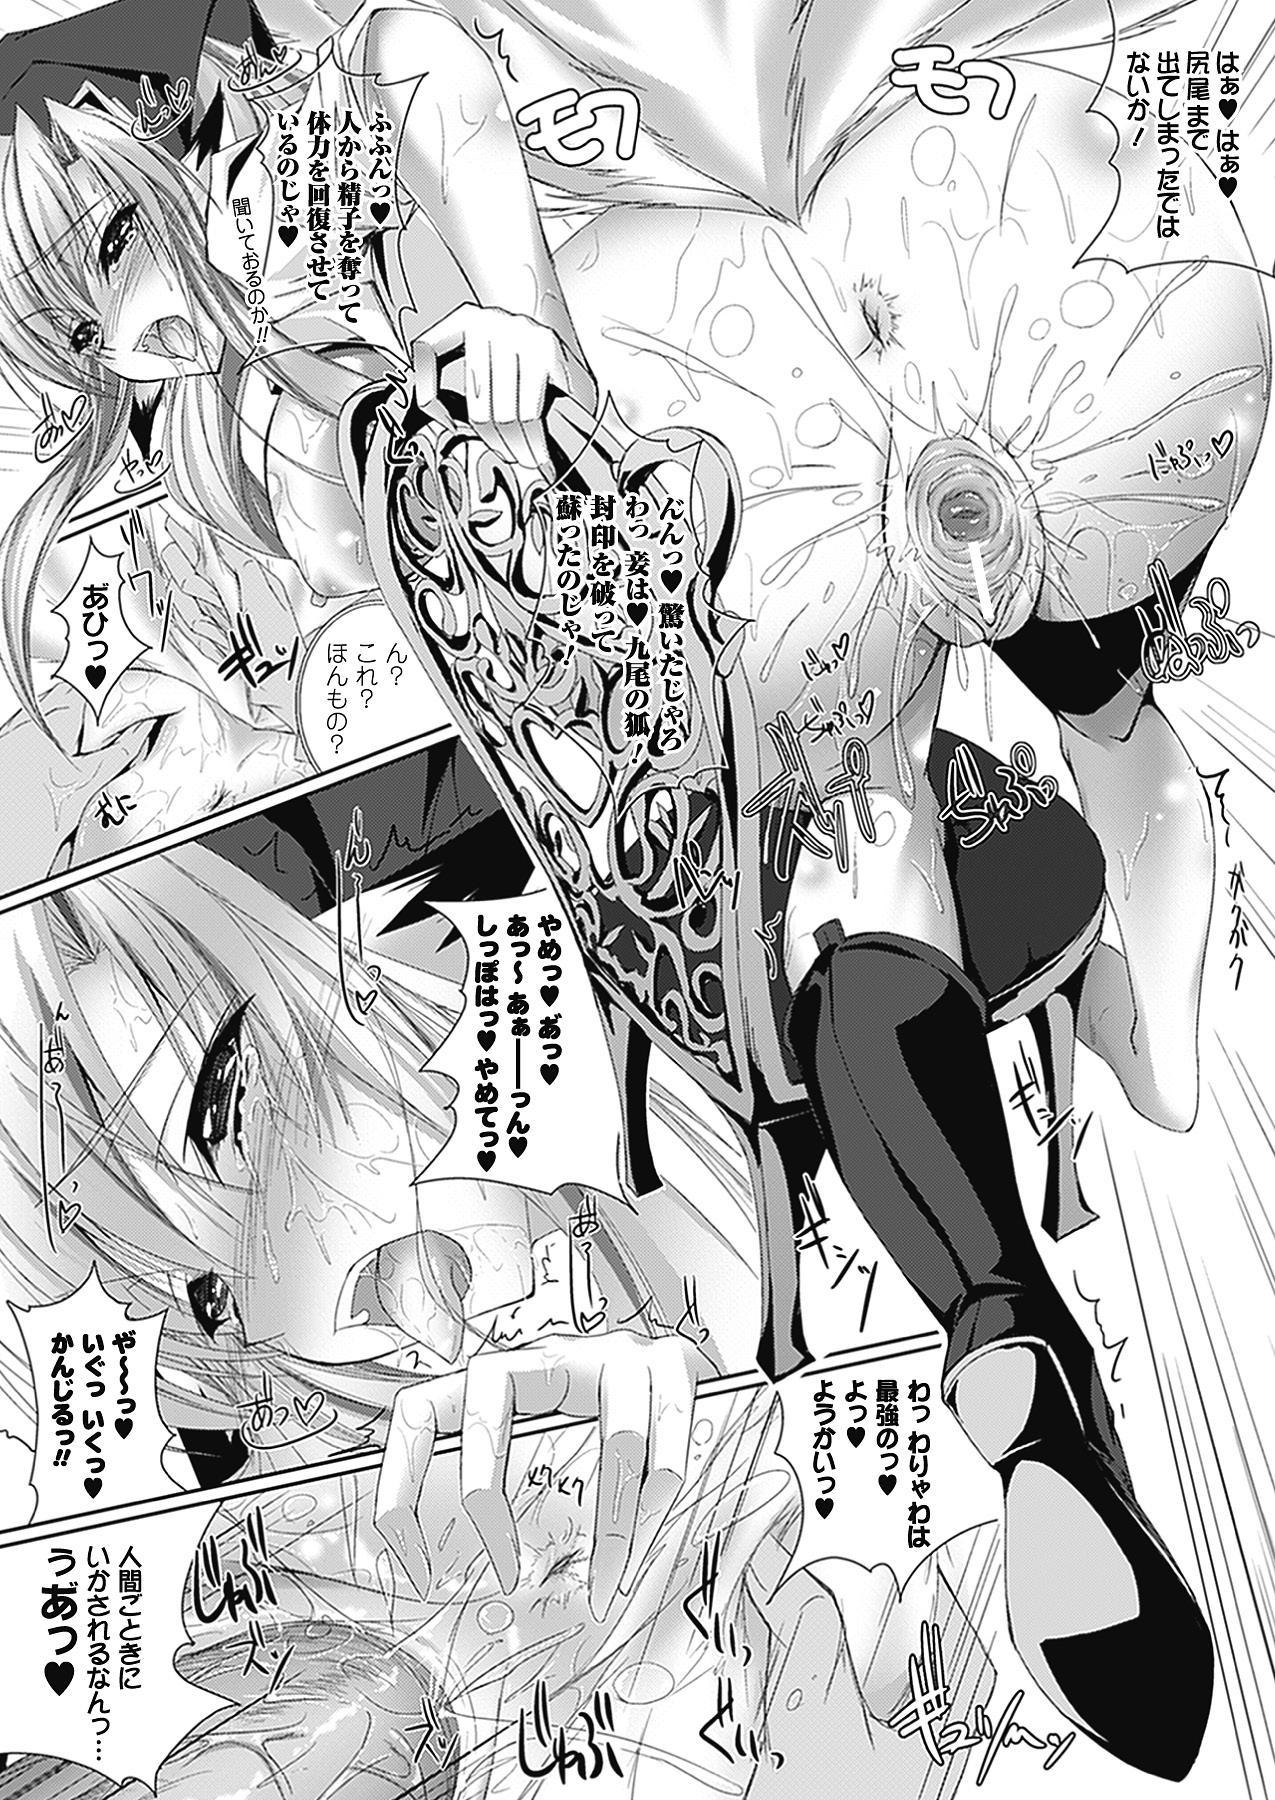 Amai Kuchibiru Torokeru Kuchibiru 127